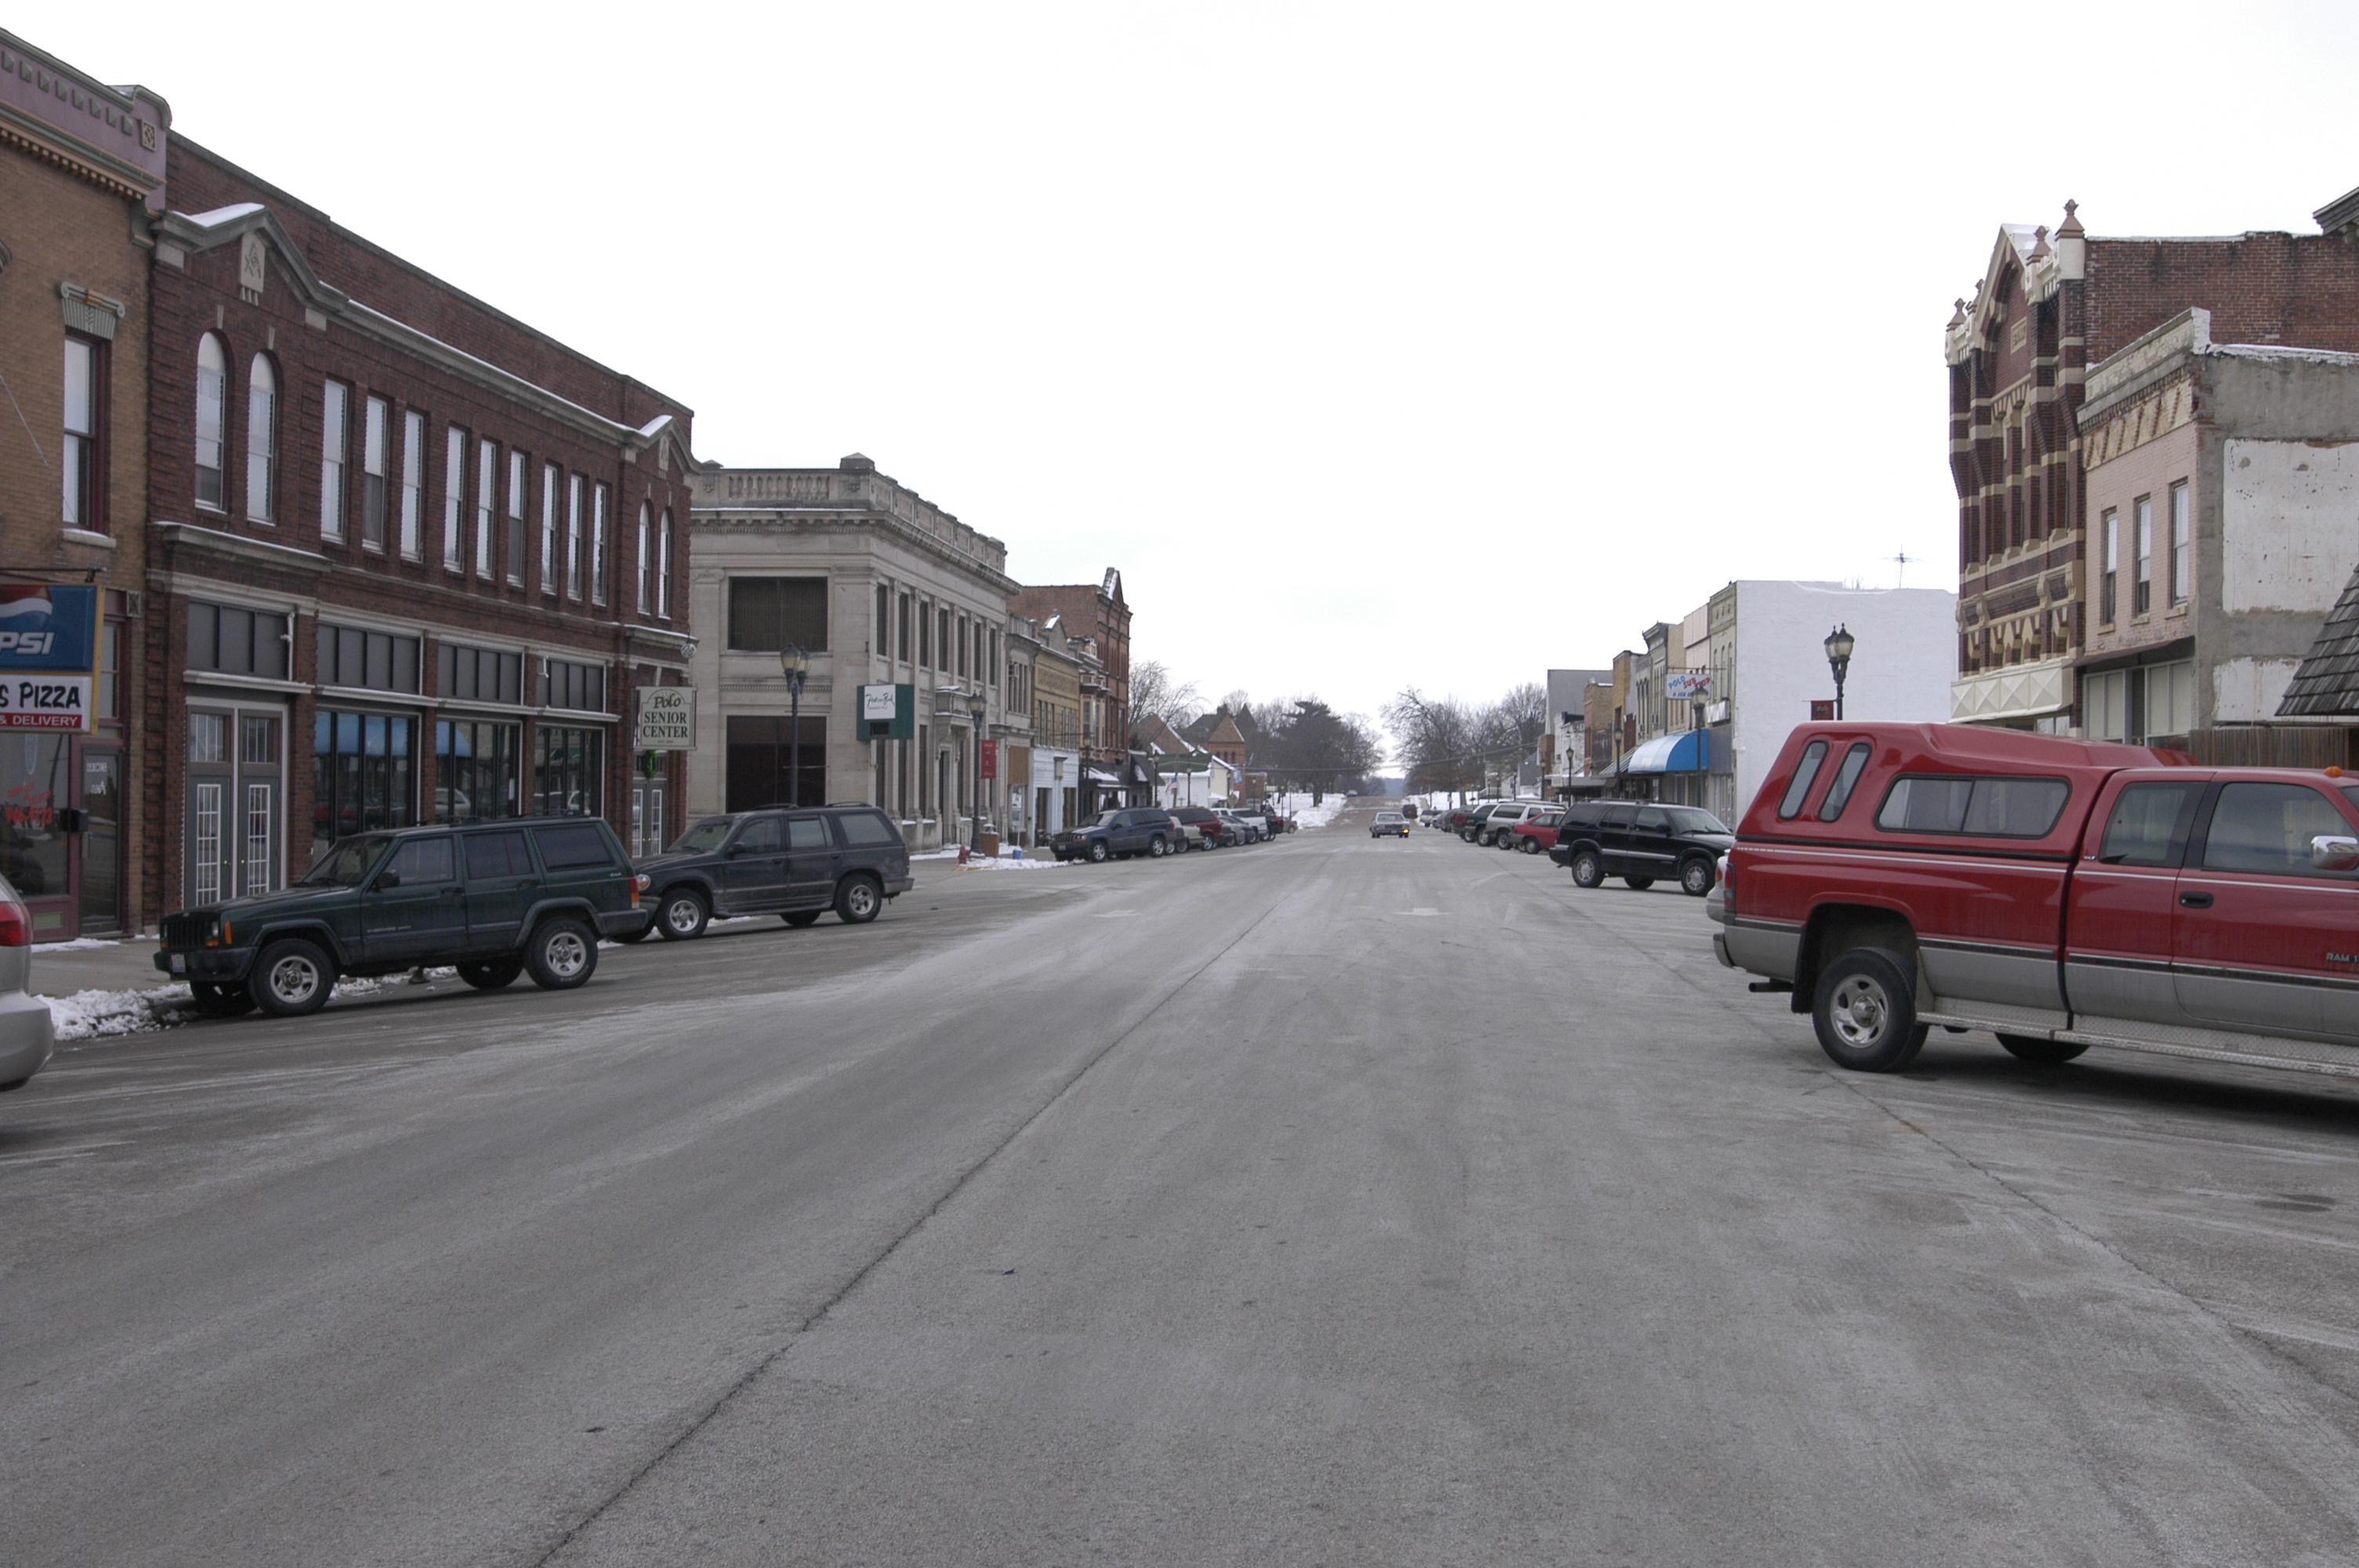 Illinois ogle county polo - File Ogle County Polo Il Downtown1 Jpg